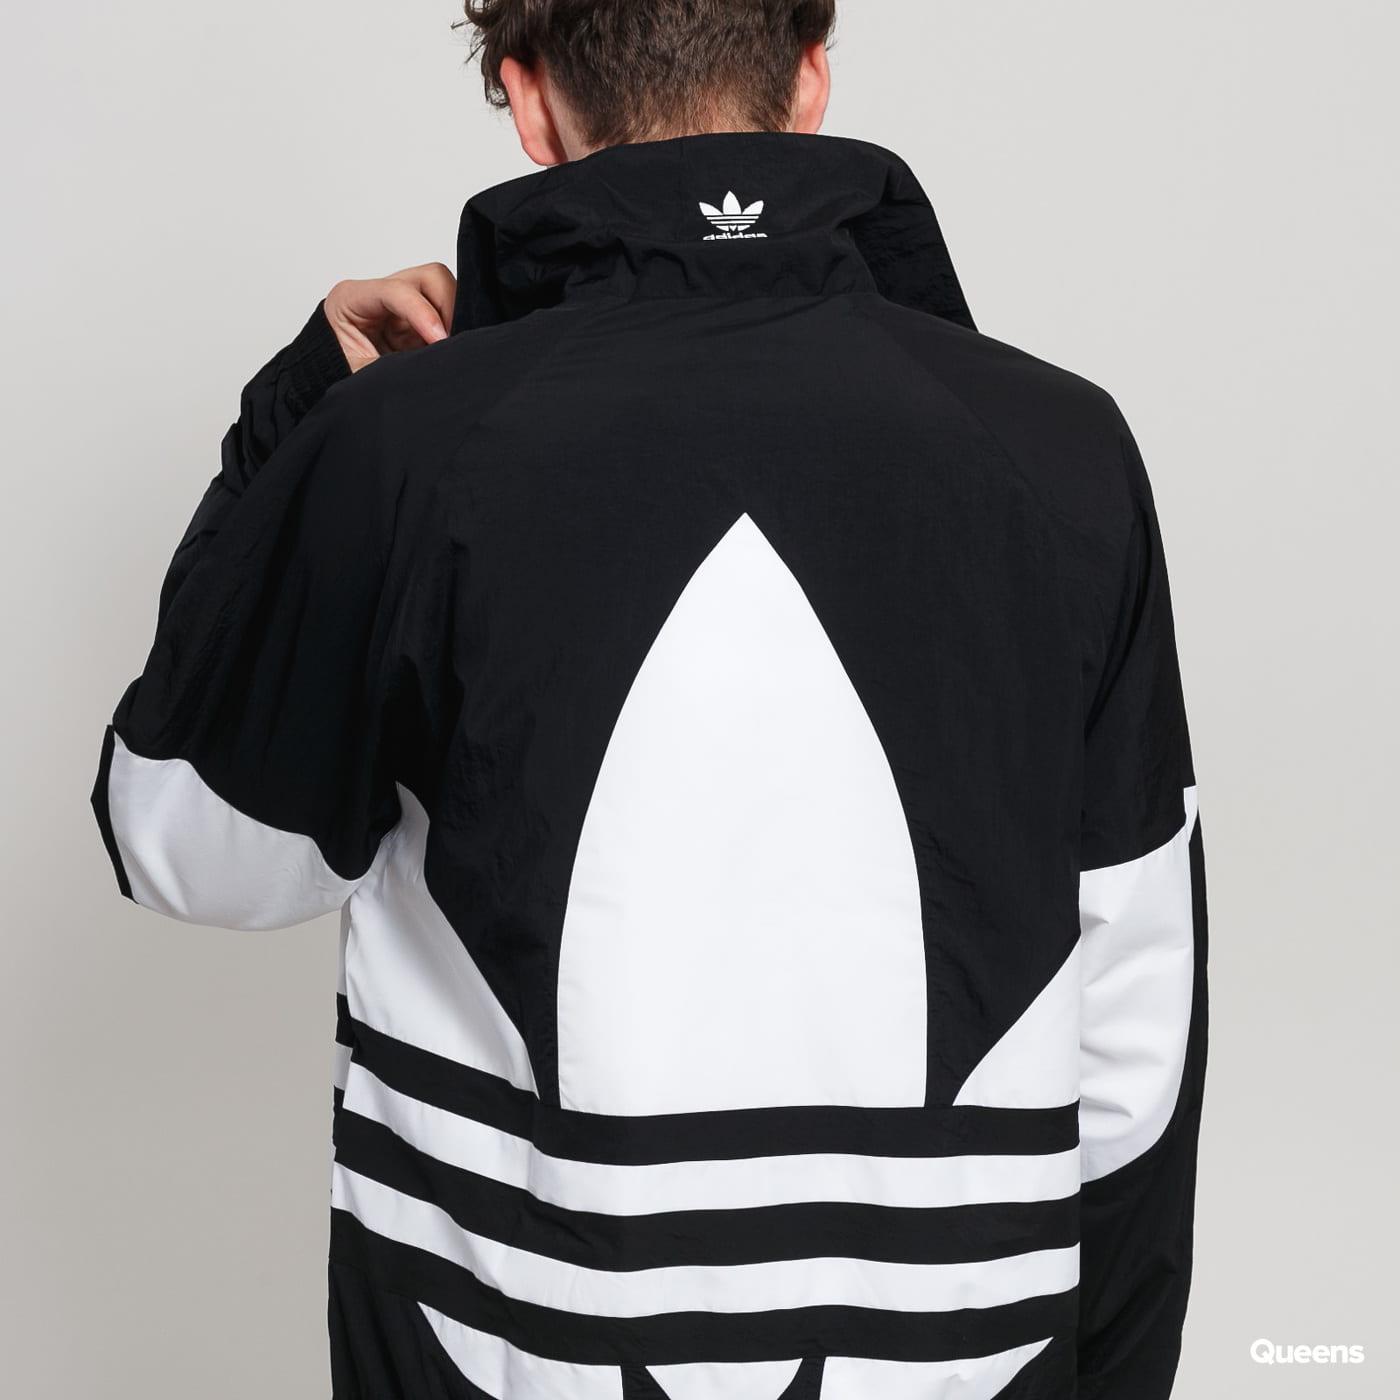 Windbreaker Adidas Originals Big Trefoil Tt Black White